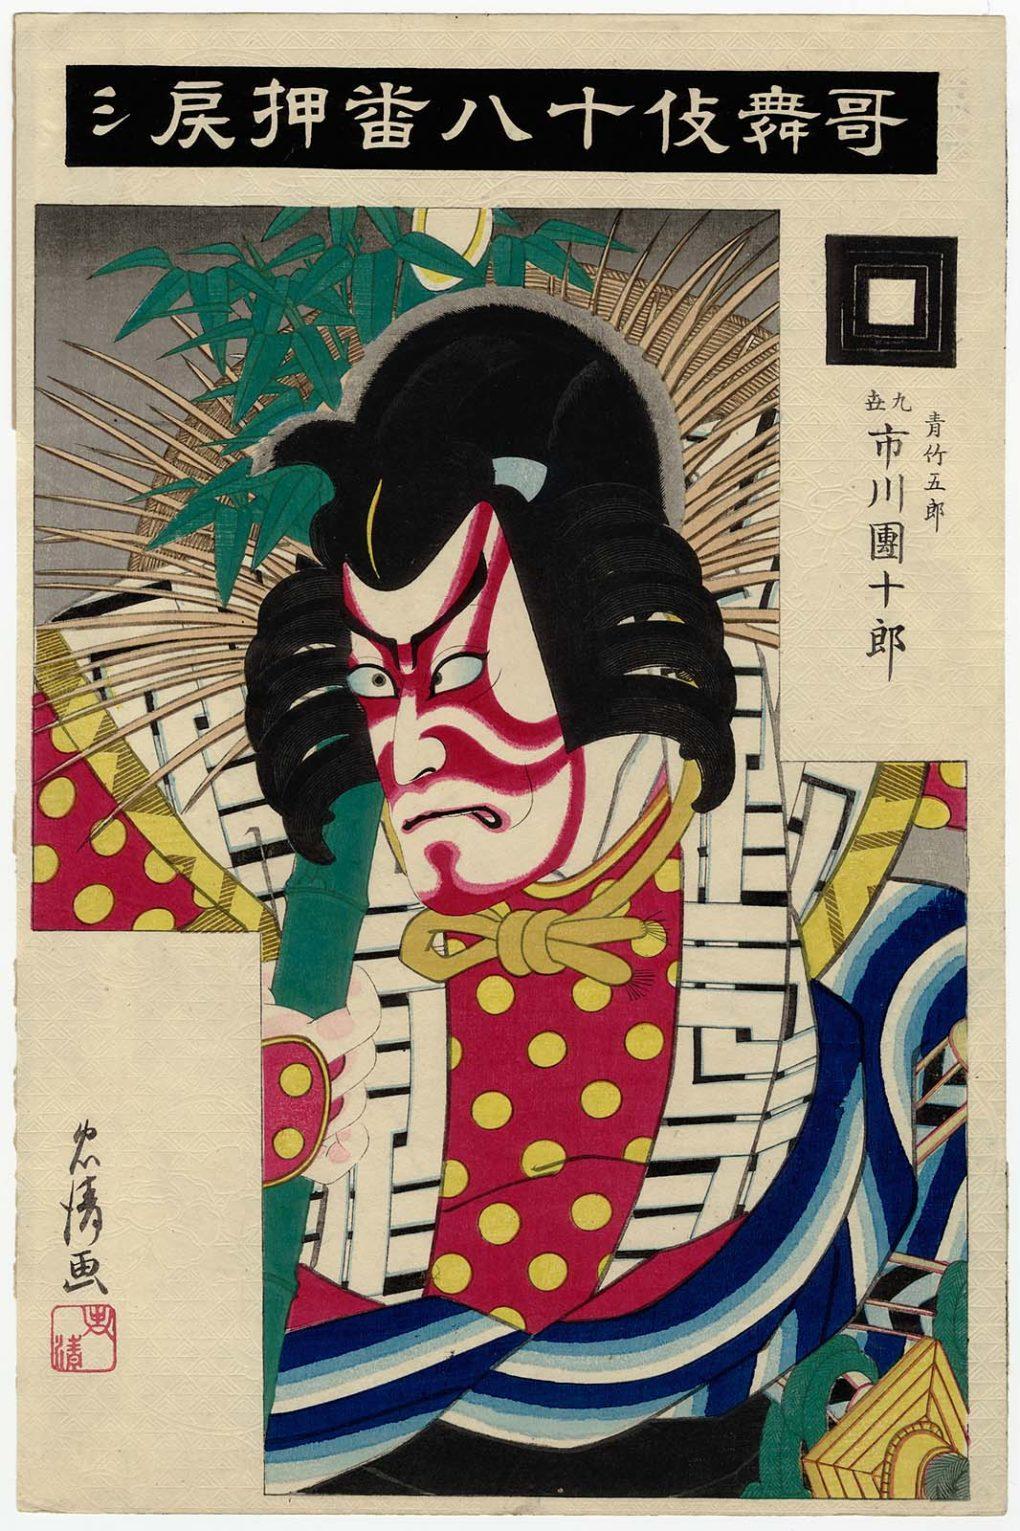 Von Tadakiyo (Hasegawa Kanbee XIV) (1847–1929) - Museum of Fine Arts, Boston, online database, Gemeinfrei, https://commons.wikimedia.org/w/index.php?curid=38440404